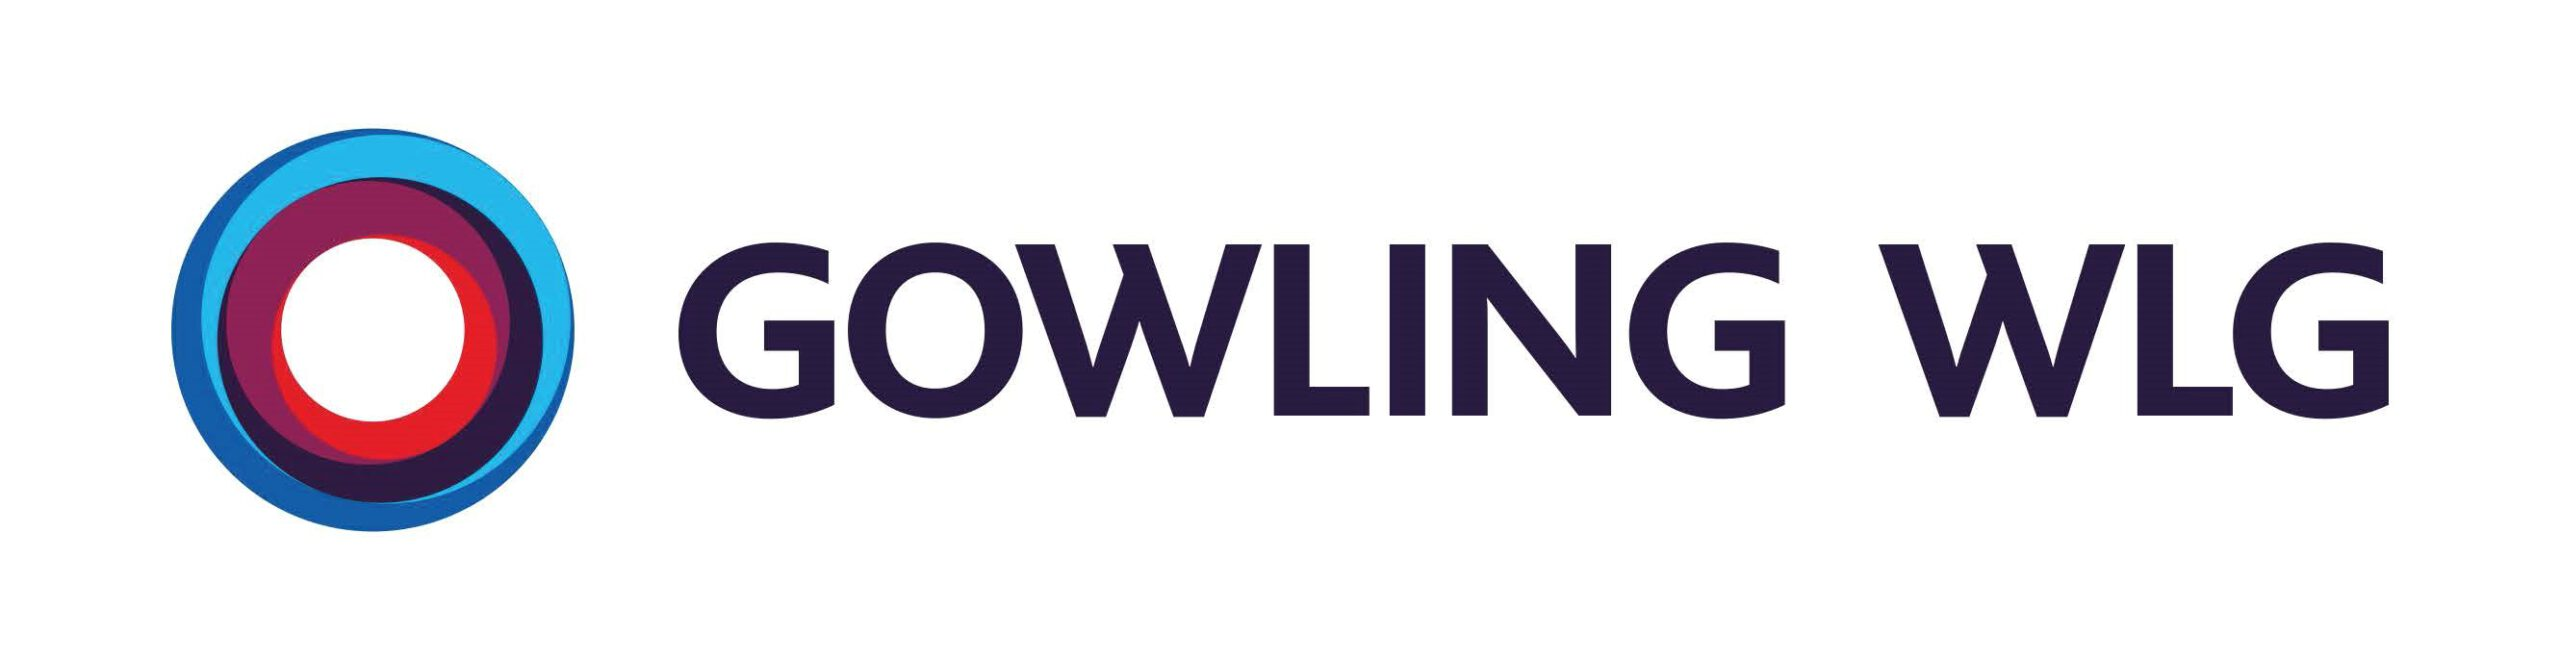 Gowling WLG Logo.